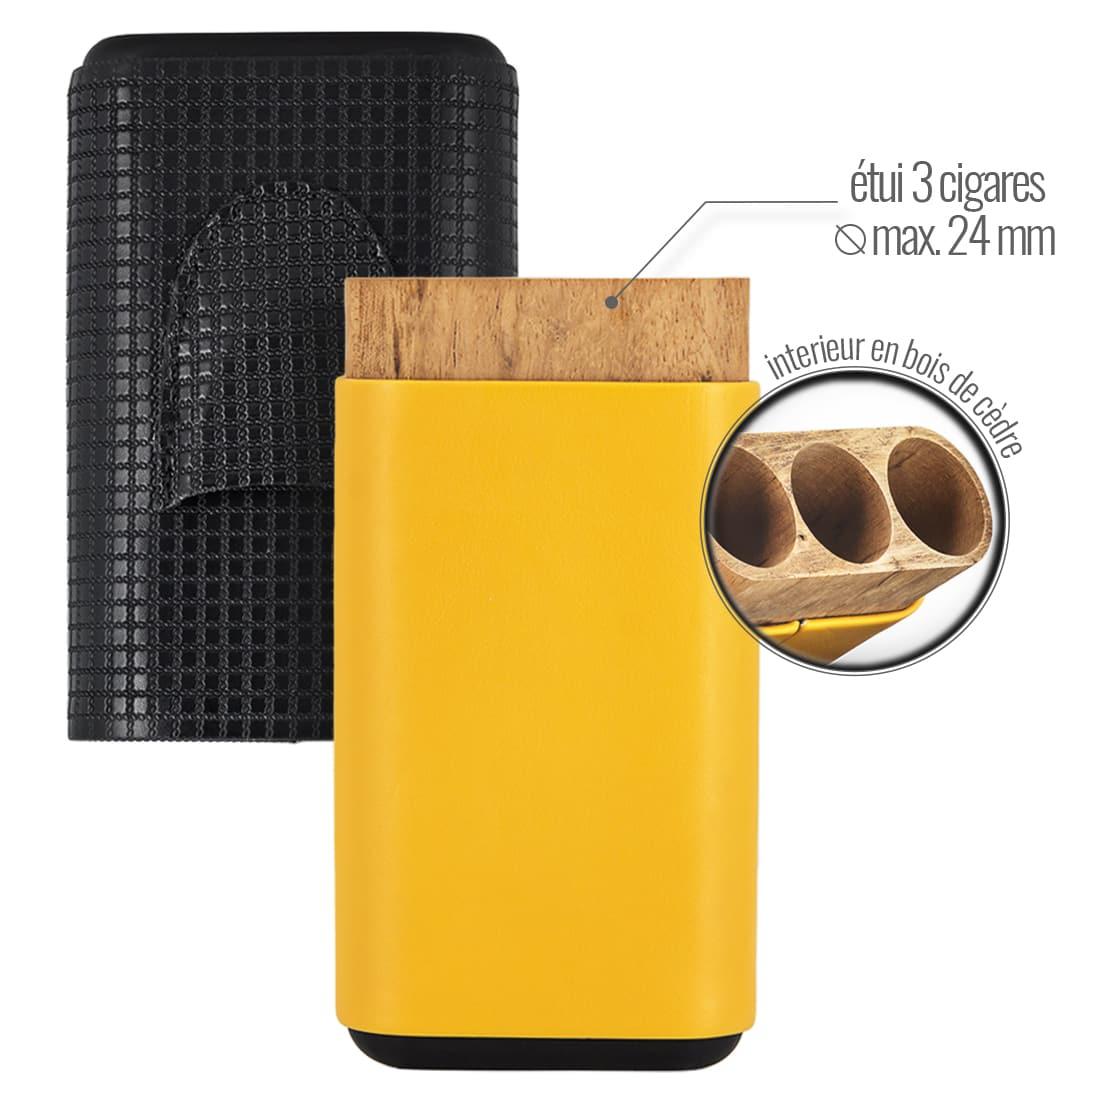 Photo #1 de Etui Rigide 3 Cigares et Coupe Cigare